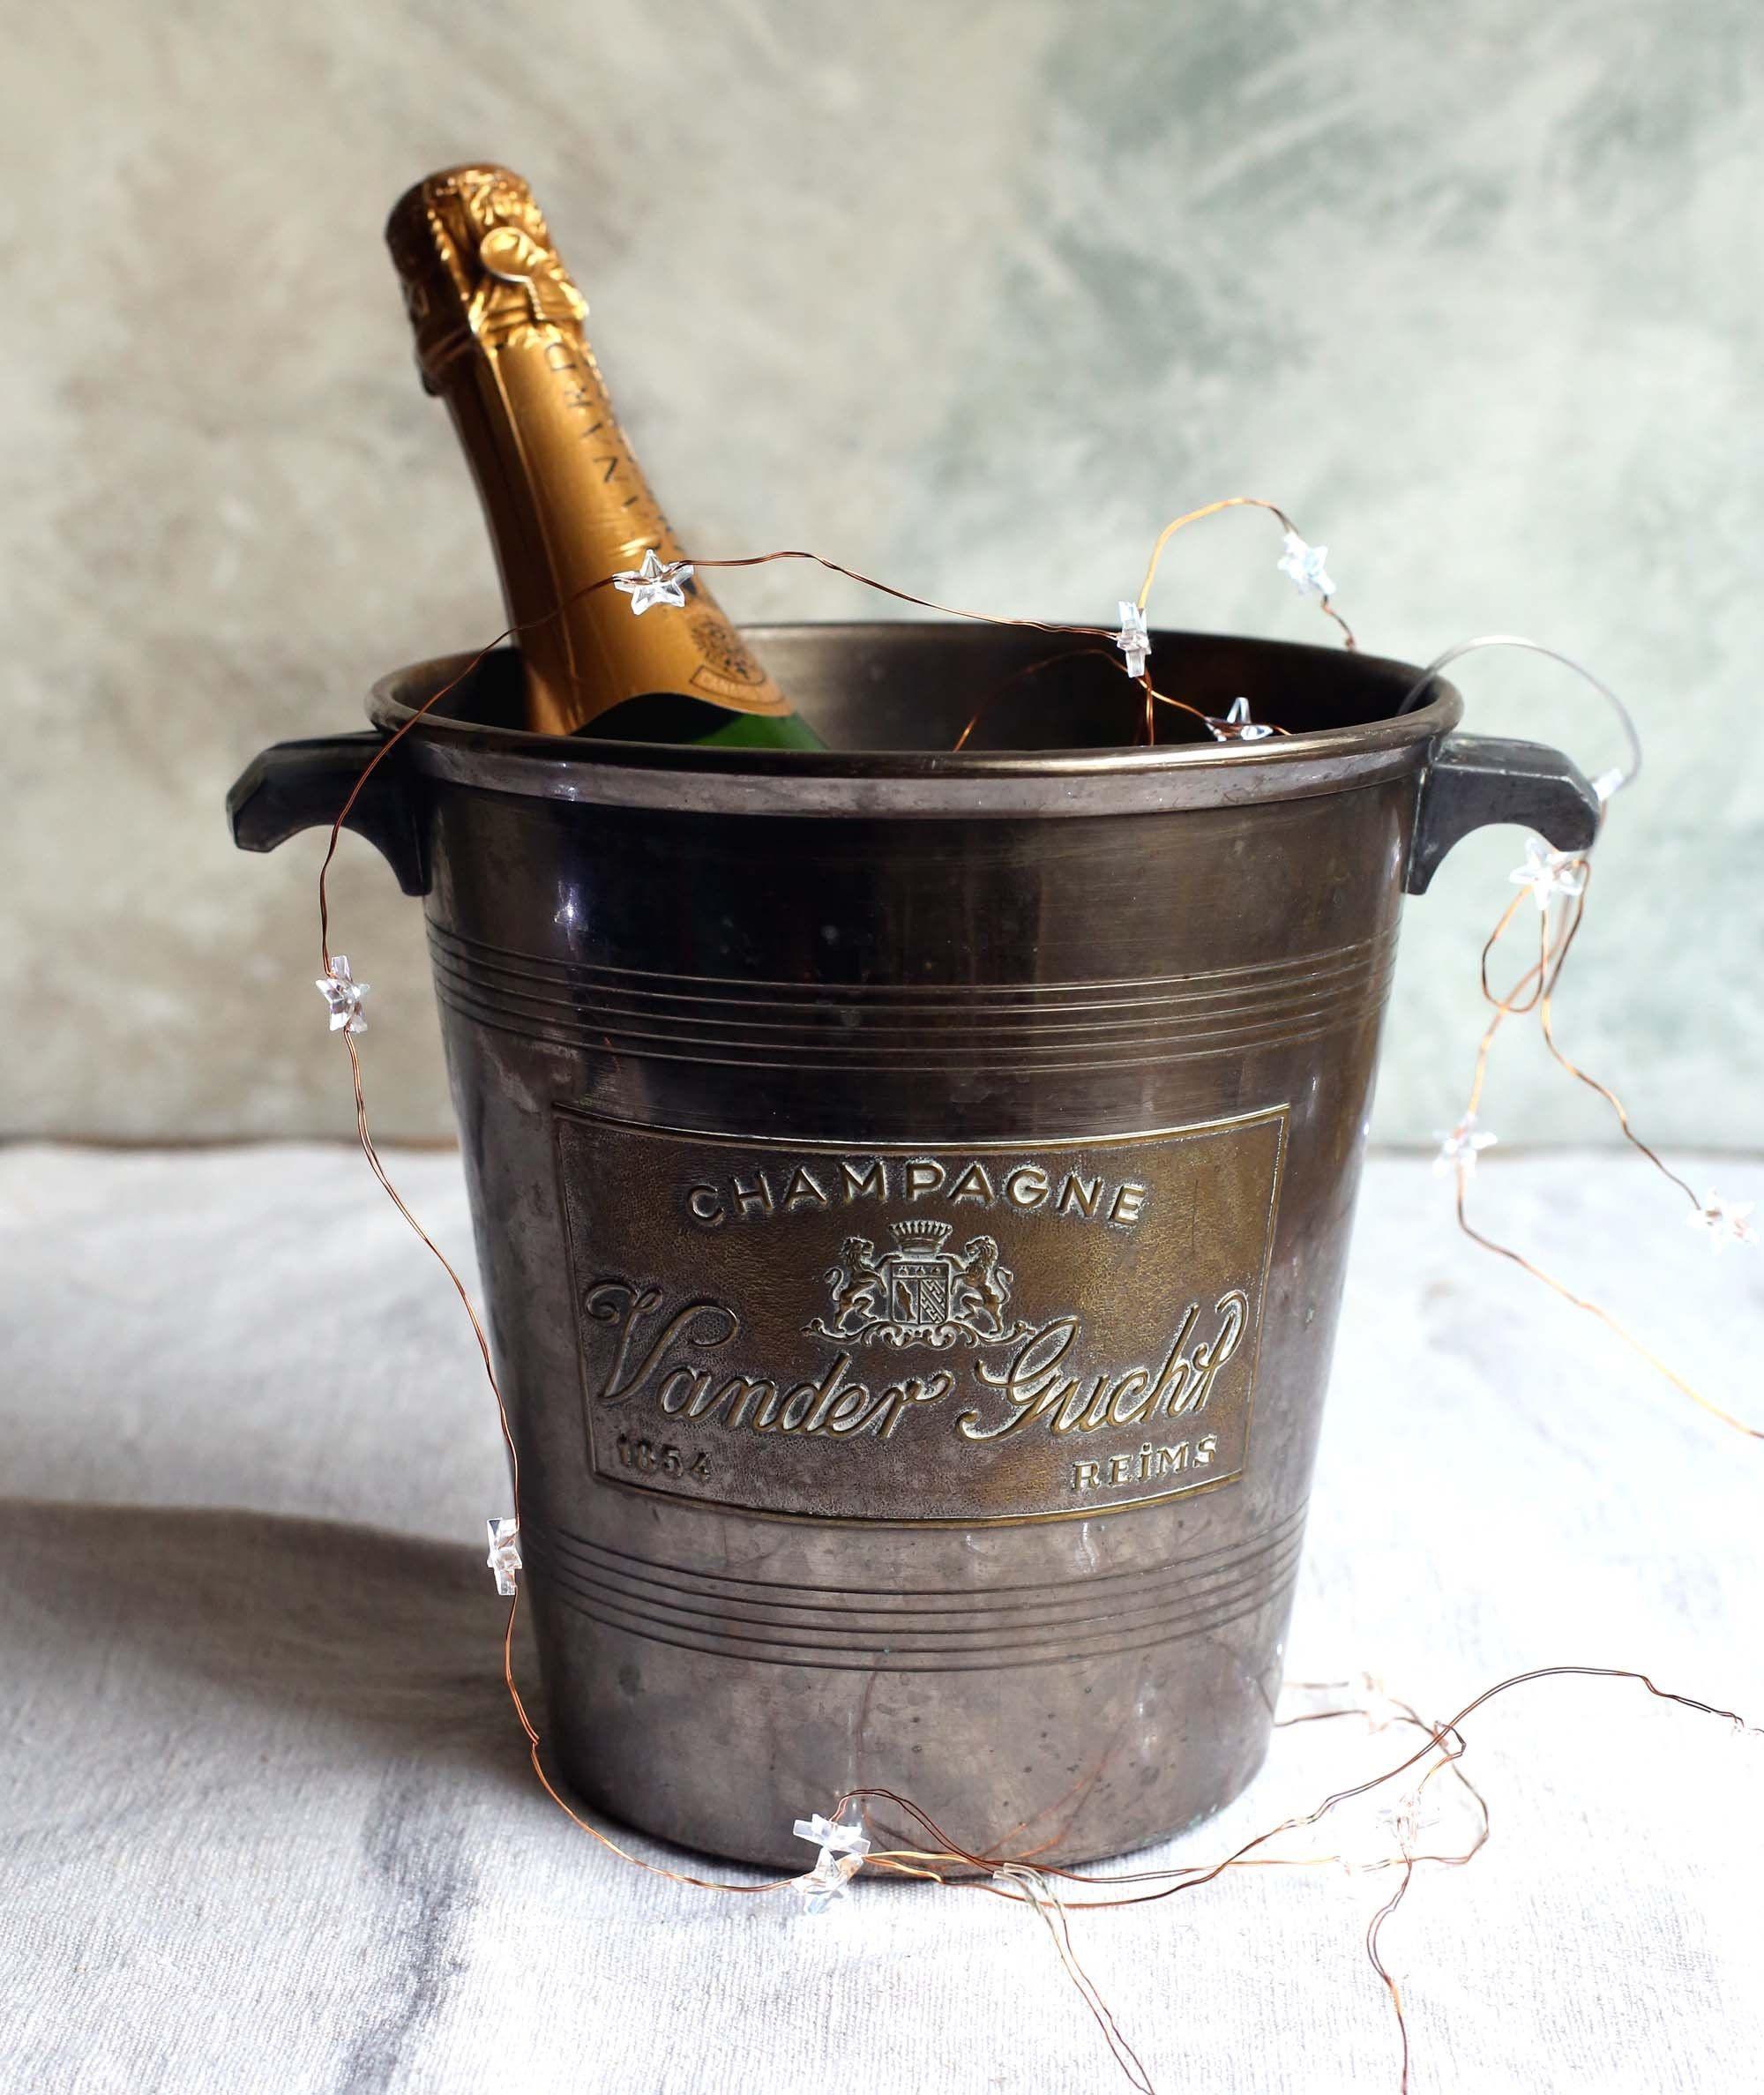 Antique French Chrome Champagne Bucket Wine Cooler Ice Bucket Art Deco Champagne Vander Gucht Vintage Barware Ice Bucket Champagne Buckets Large Ice Bucket